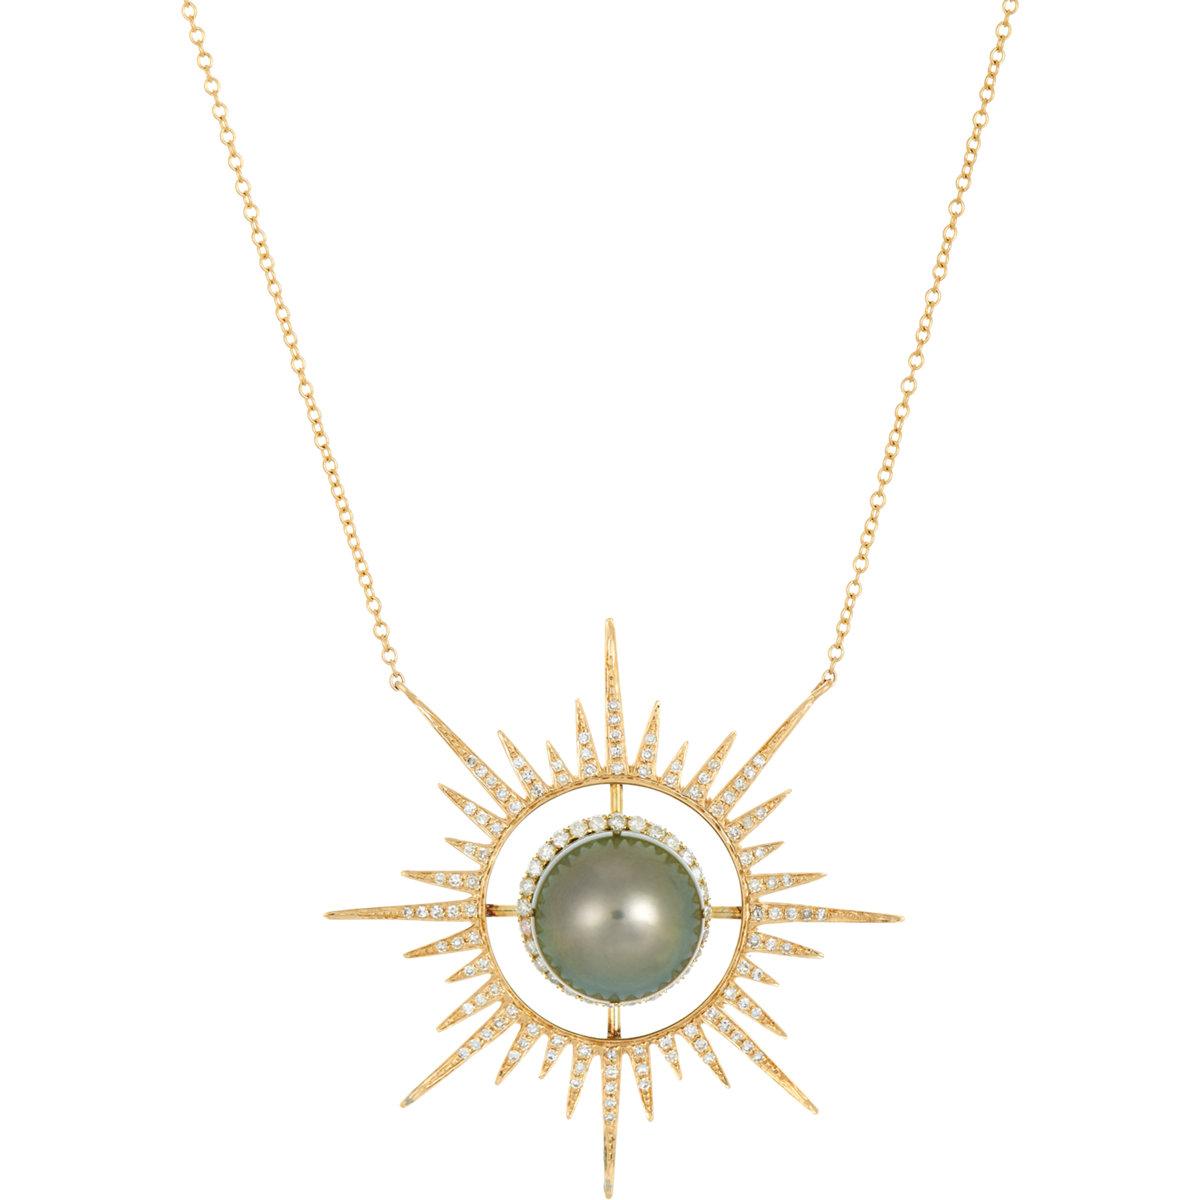 Lyst samira 13 womens starburst pendant necklace in metallic gallery mozeypictures Images